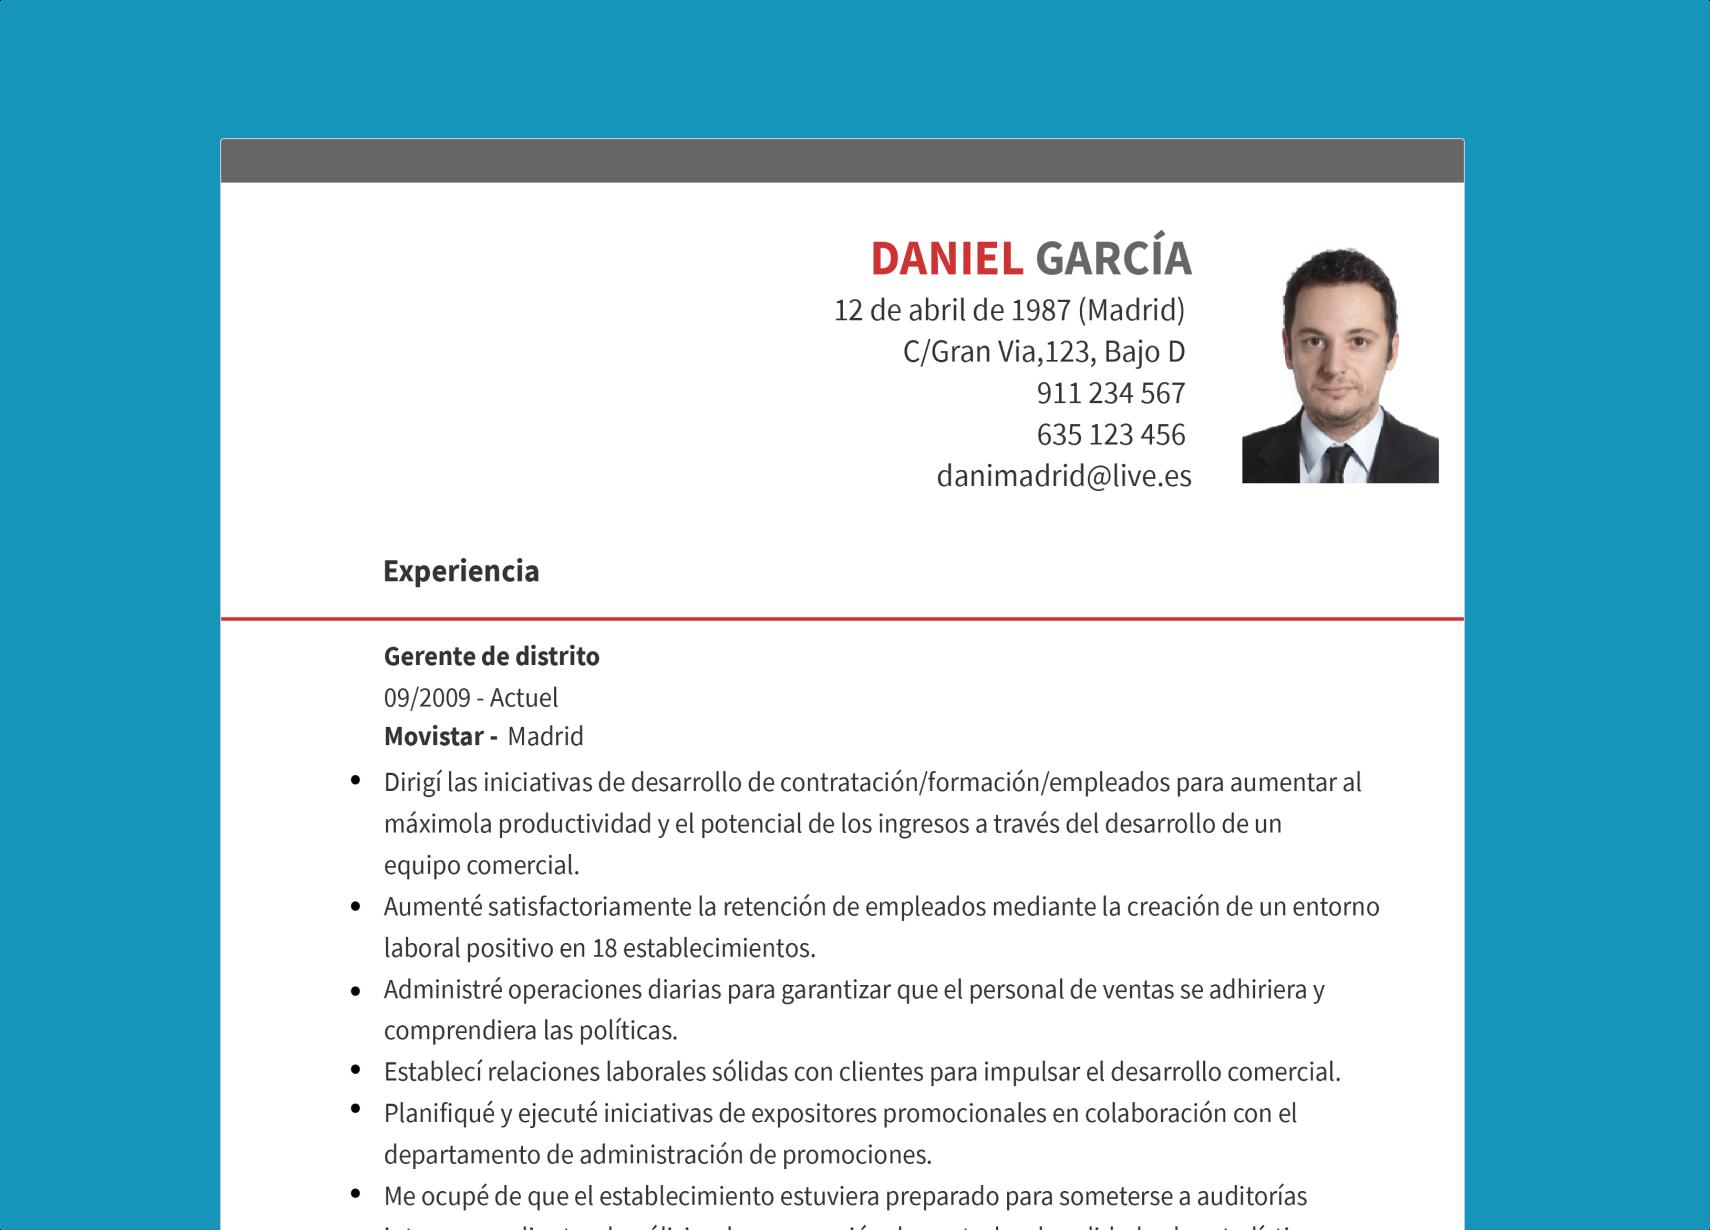 Asesoramiento profesional para hacer tu CV